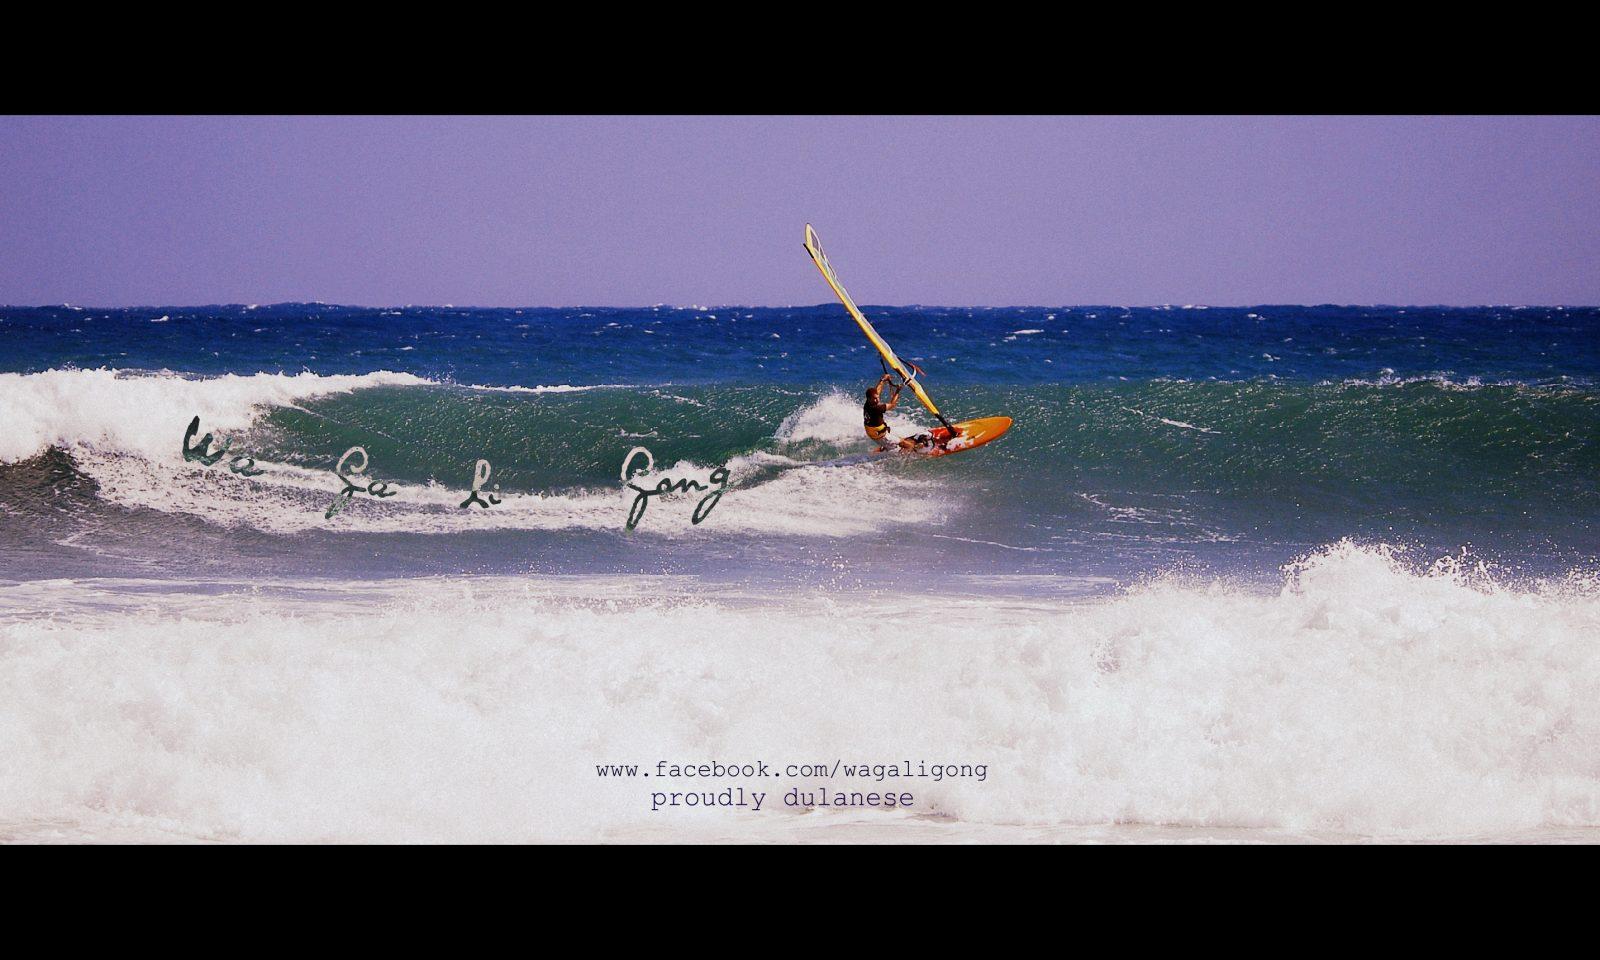 windsurfing-in-Taiwan-Taitung-Jinzun-e1465160873567